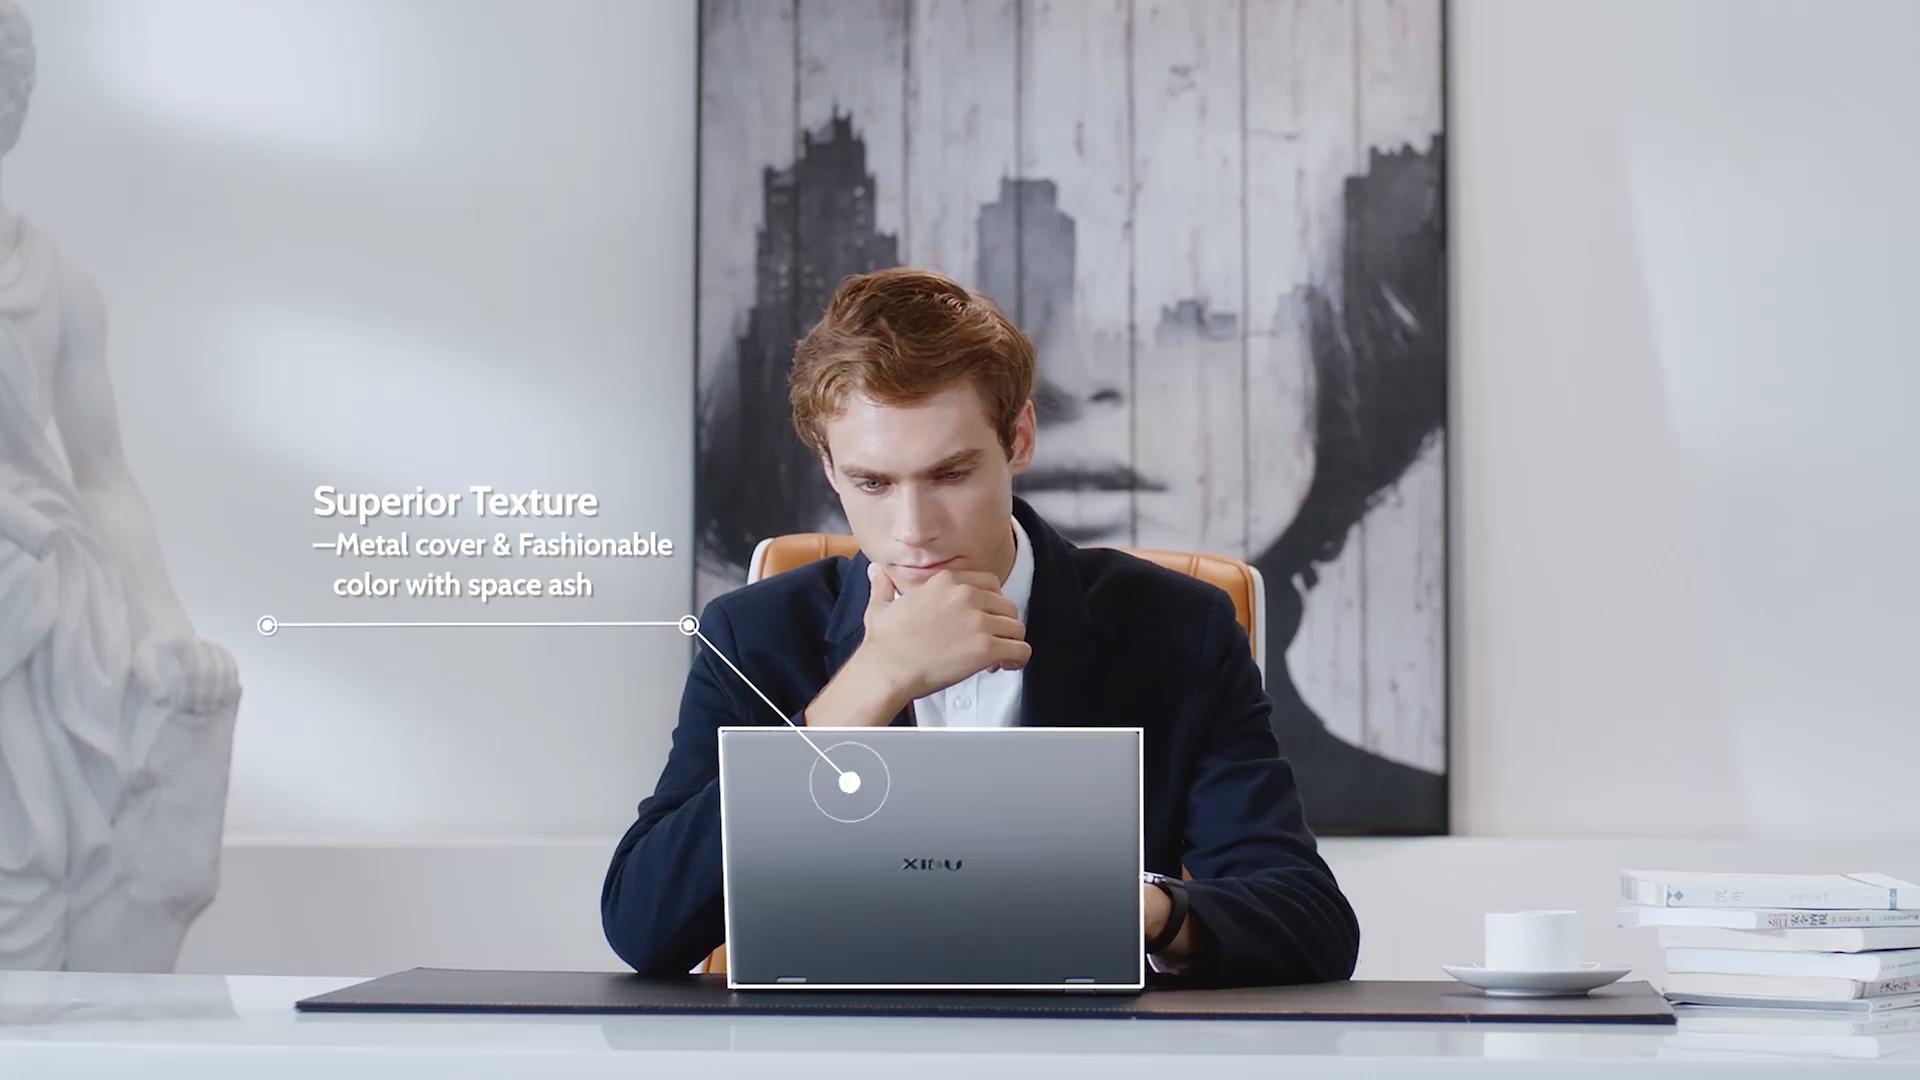 XIDU 13.3 인치 인텔 코어 I5 8GB RAM 128GB SSD 터치 스크린 360 학위 플립 백라이트 키보드 노트북